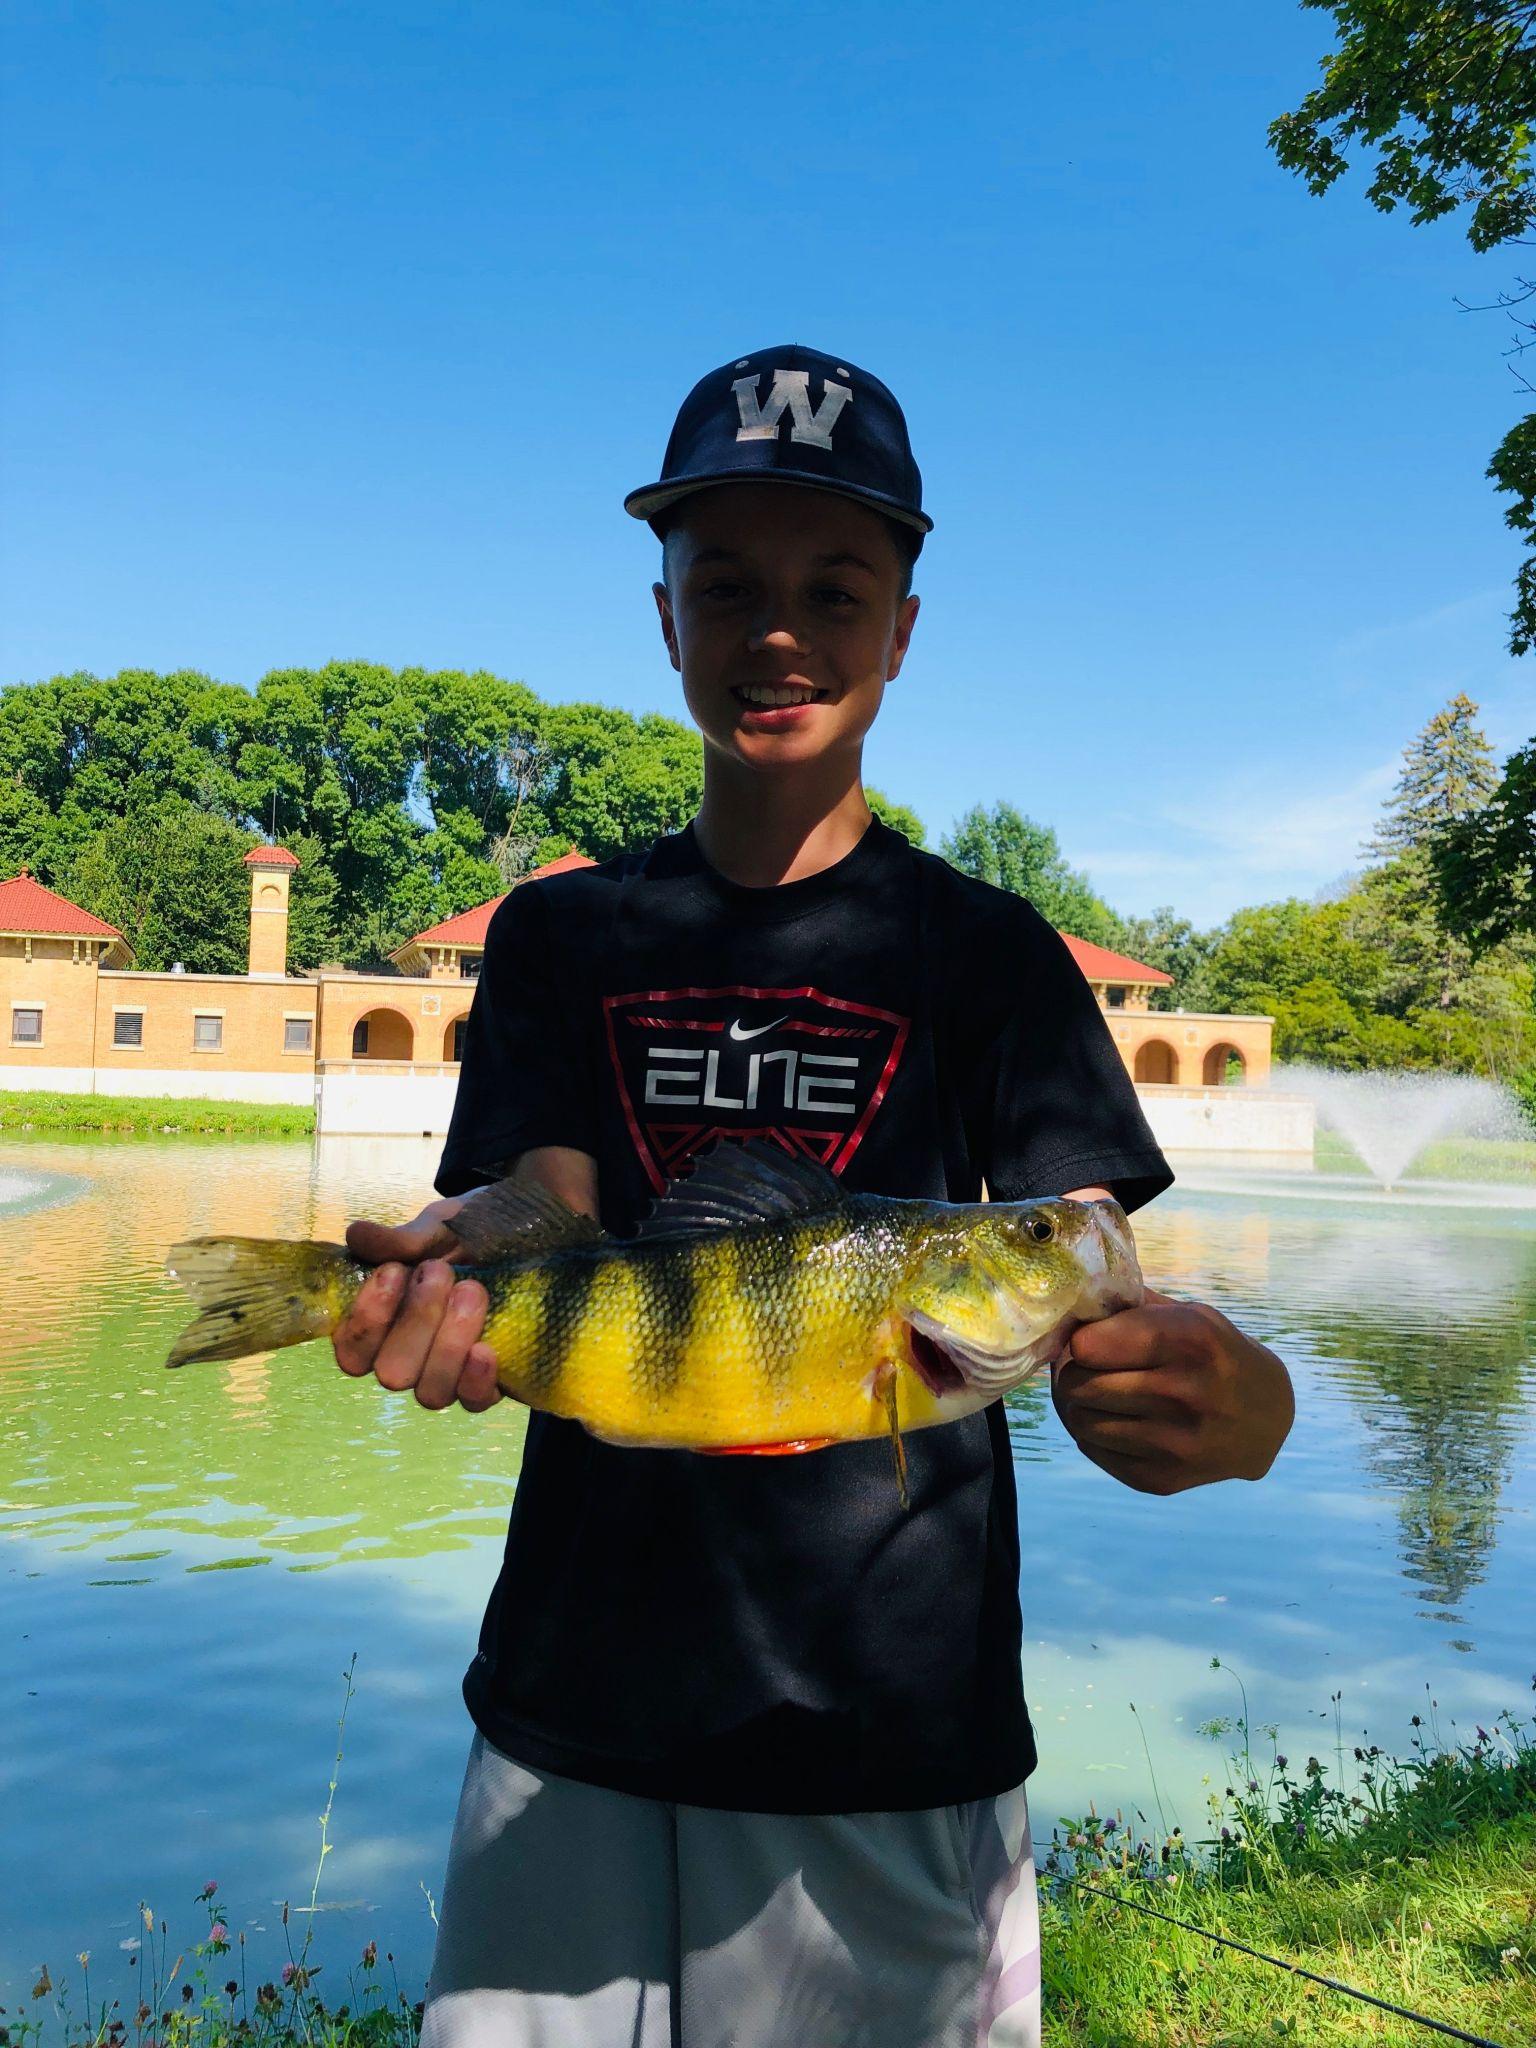 Student catches 38-pound carp in Albany's Washington Park